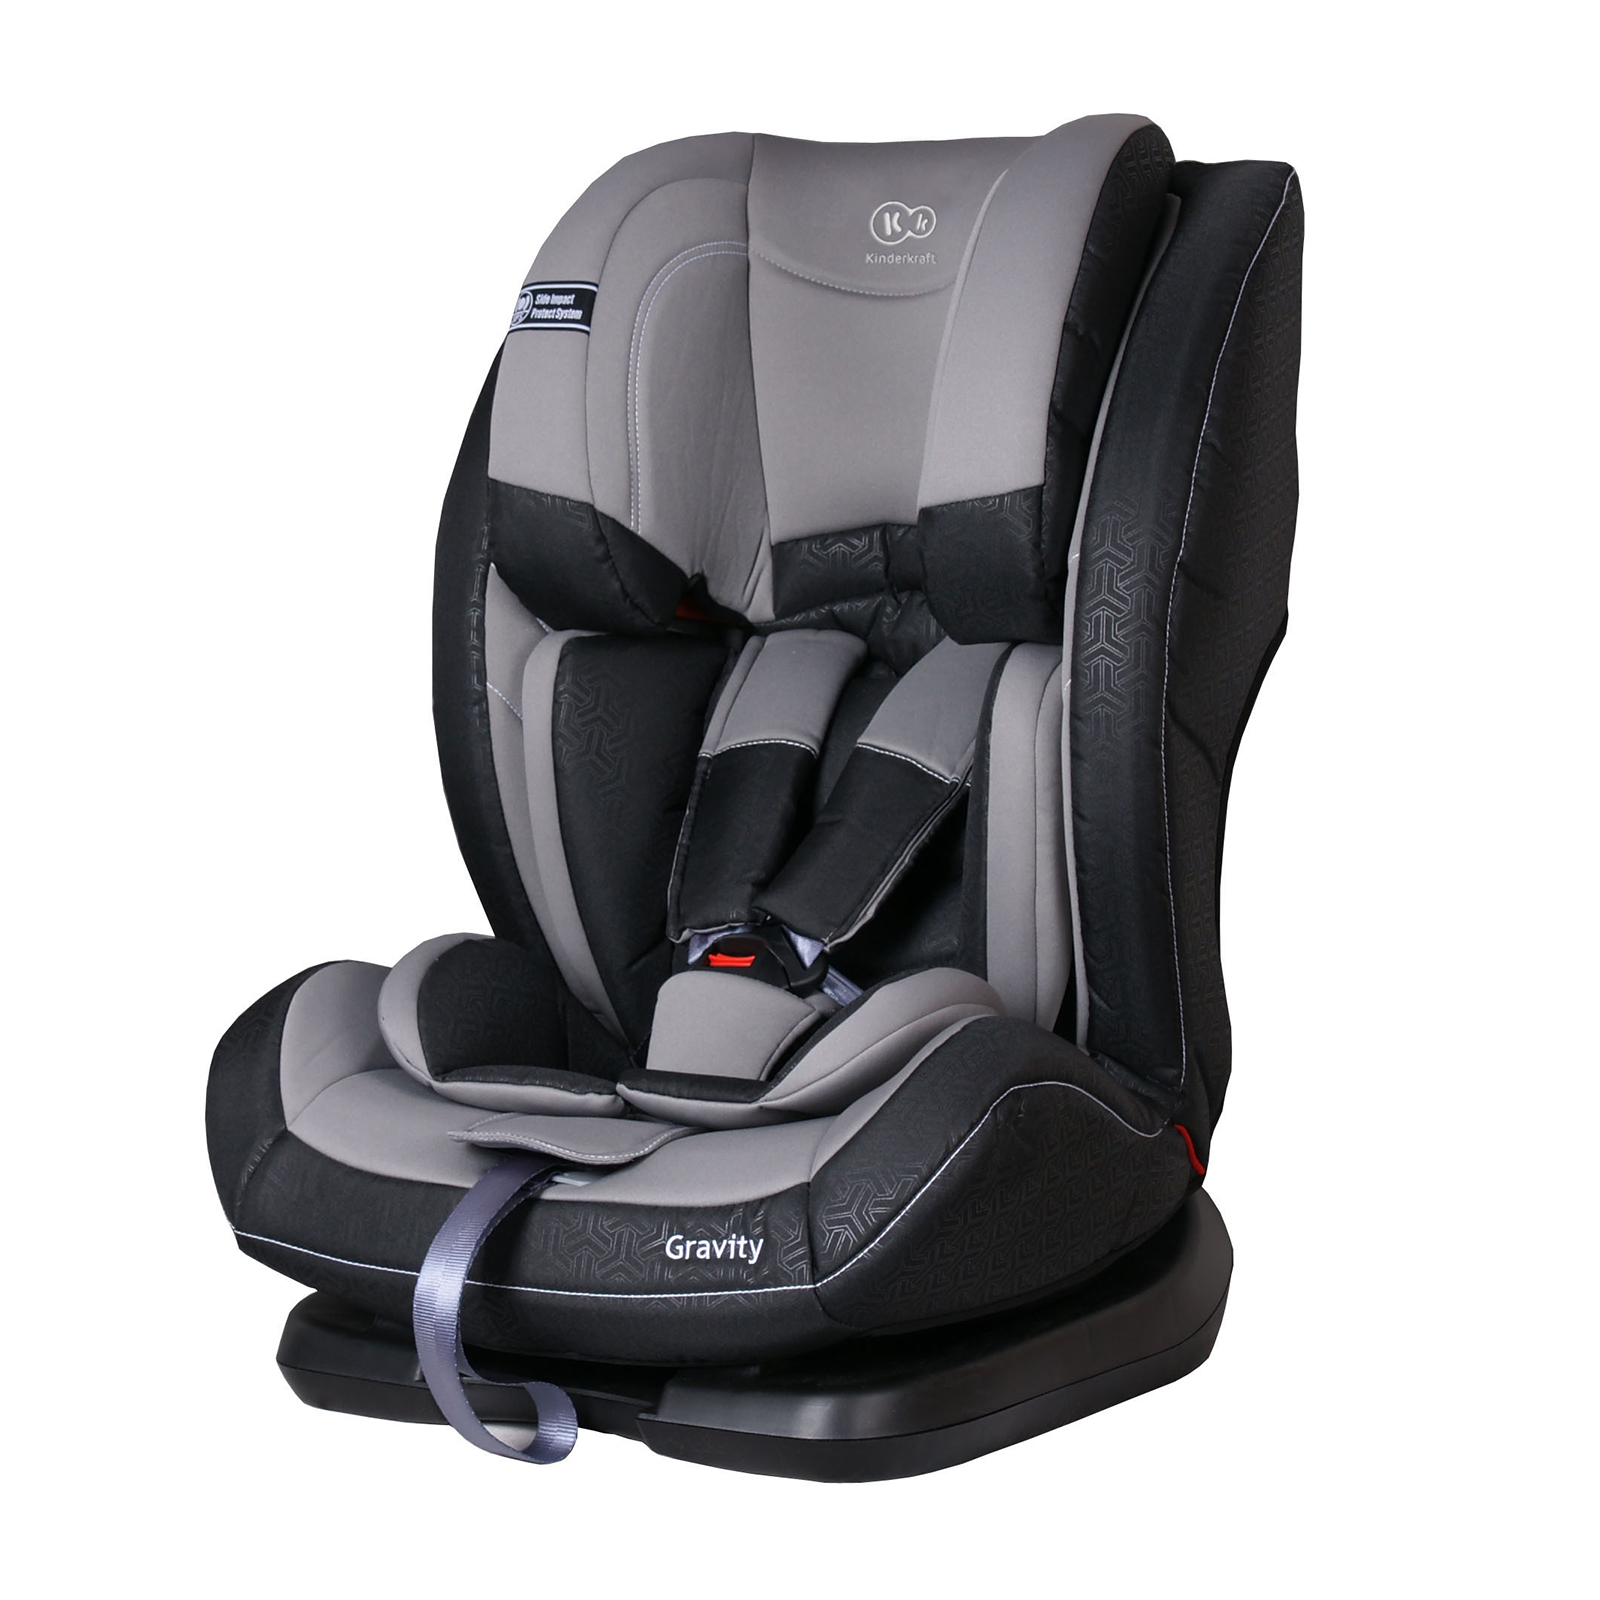 kinderkraft gravity kinderautositz kindersitz autositz gruppe 1 2 3 neu 9 36 kg ebay. Black Bedroom Furniture Sets. Home Design Ideas